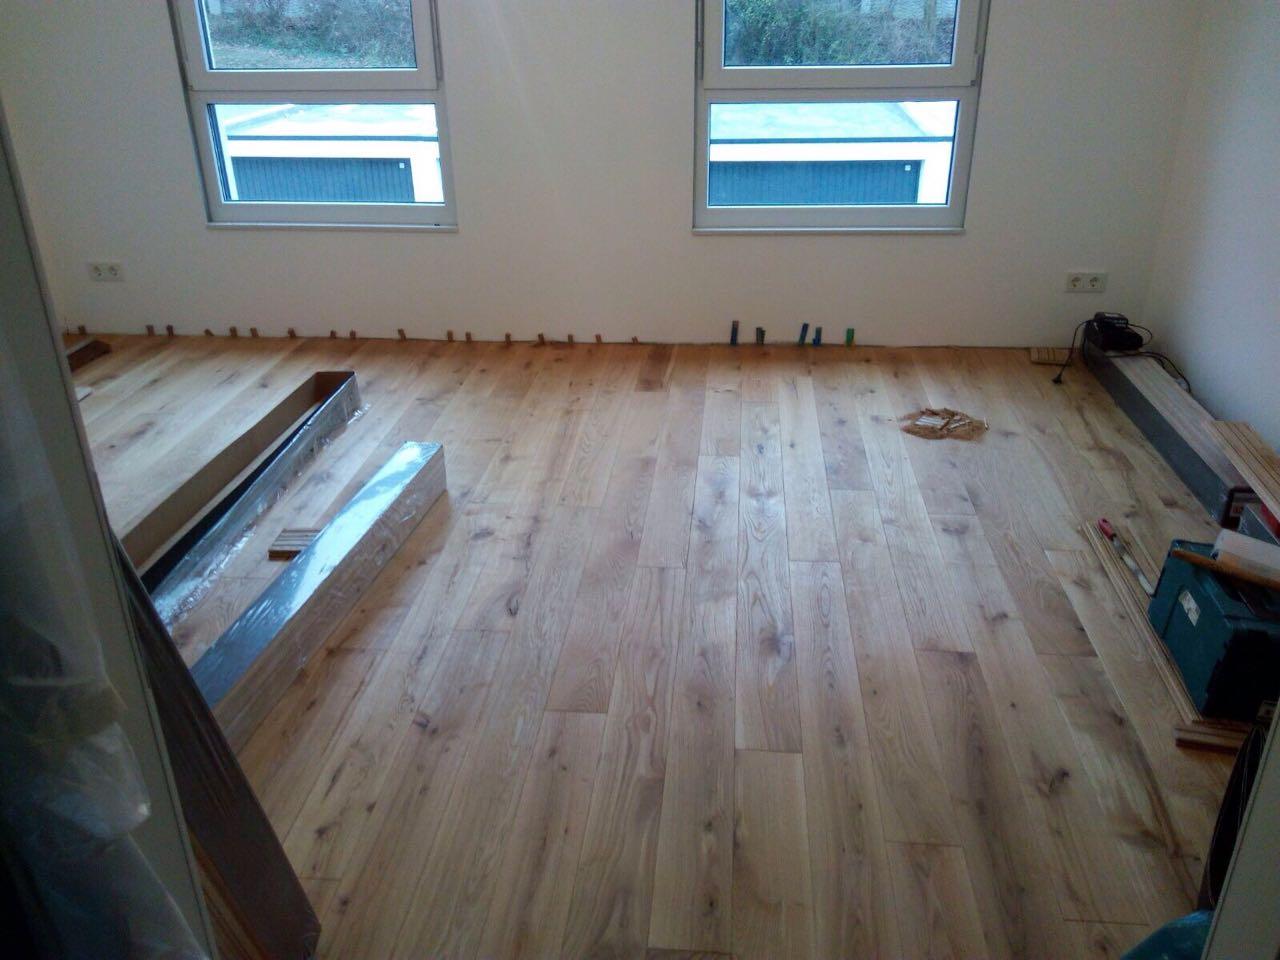 Steckdosen Im Fußboden ~ Steckdosen im fußboden hohe steckdosen hohe steckdosen fussboden